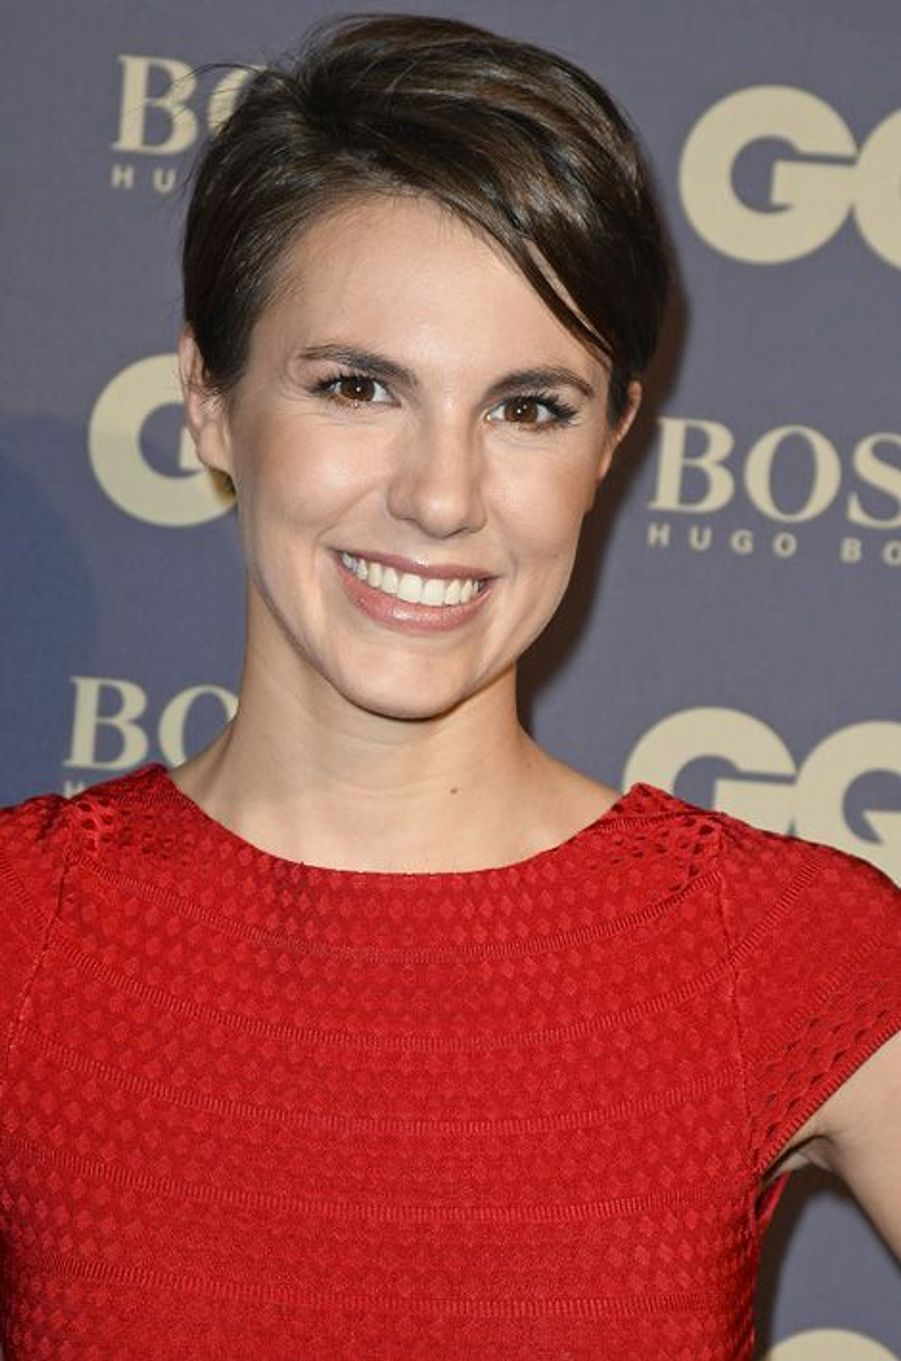 Emilie Besse